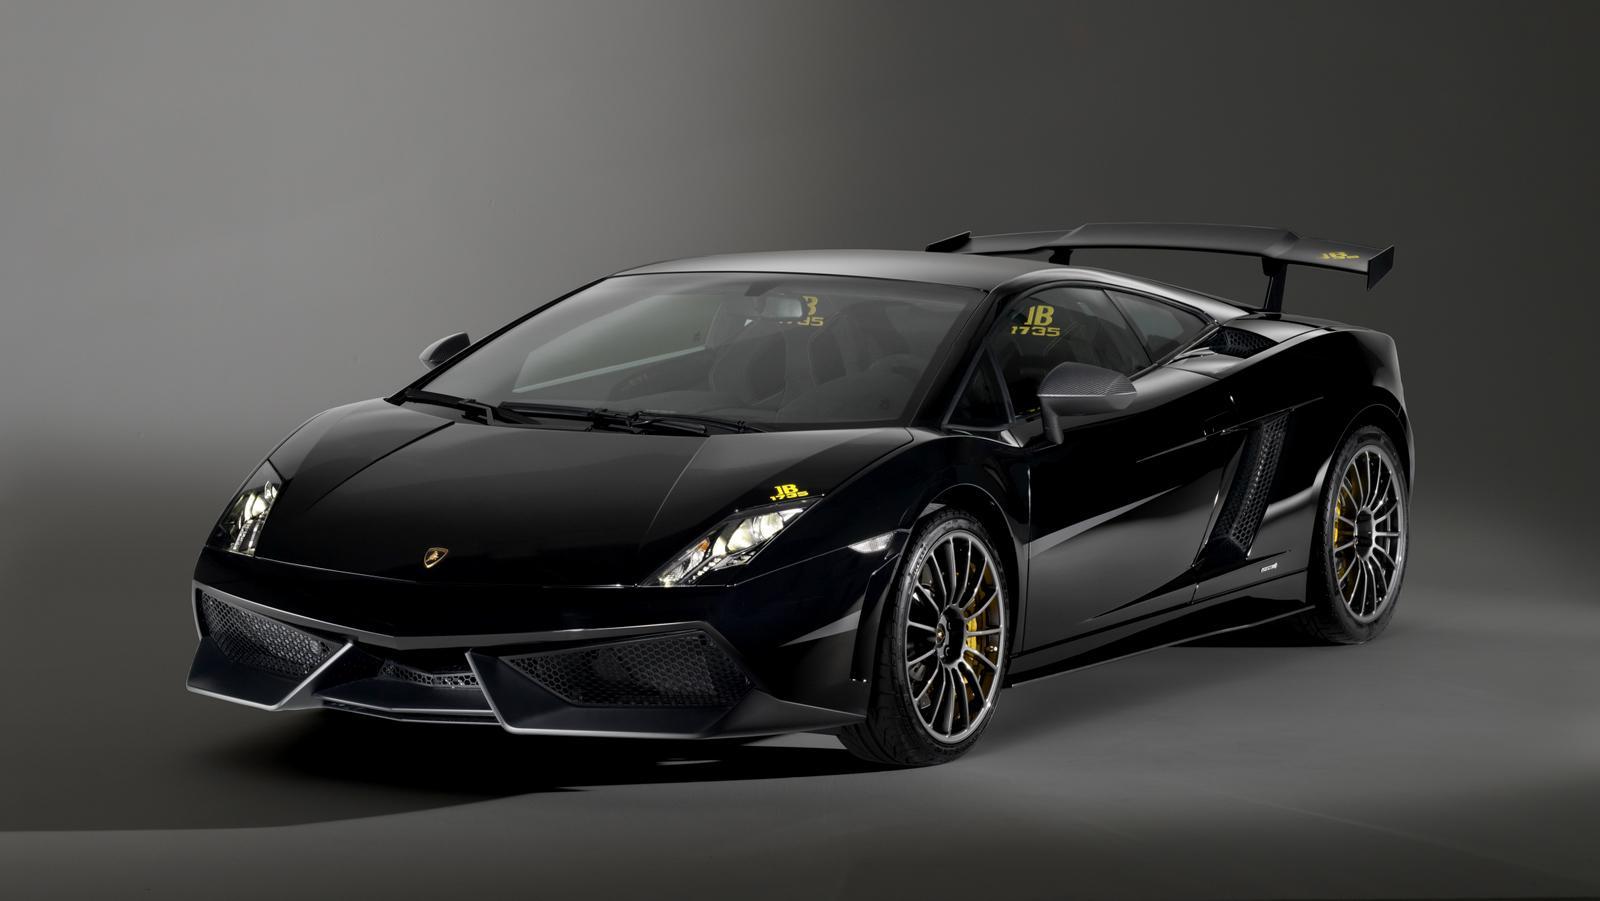 Avenged Car Extreme Car Lamborghini Gallardo Lp570 4 Black Edition